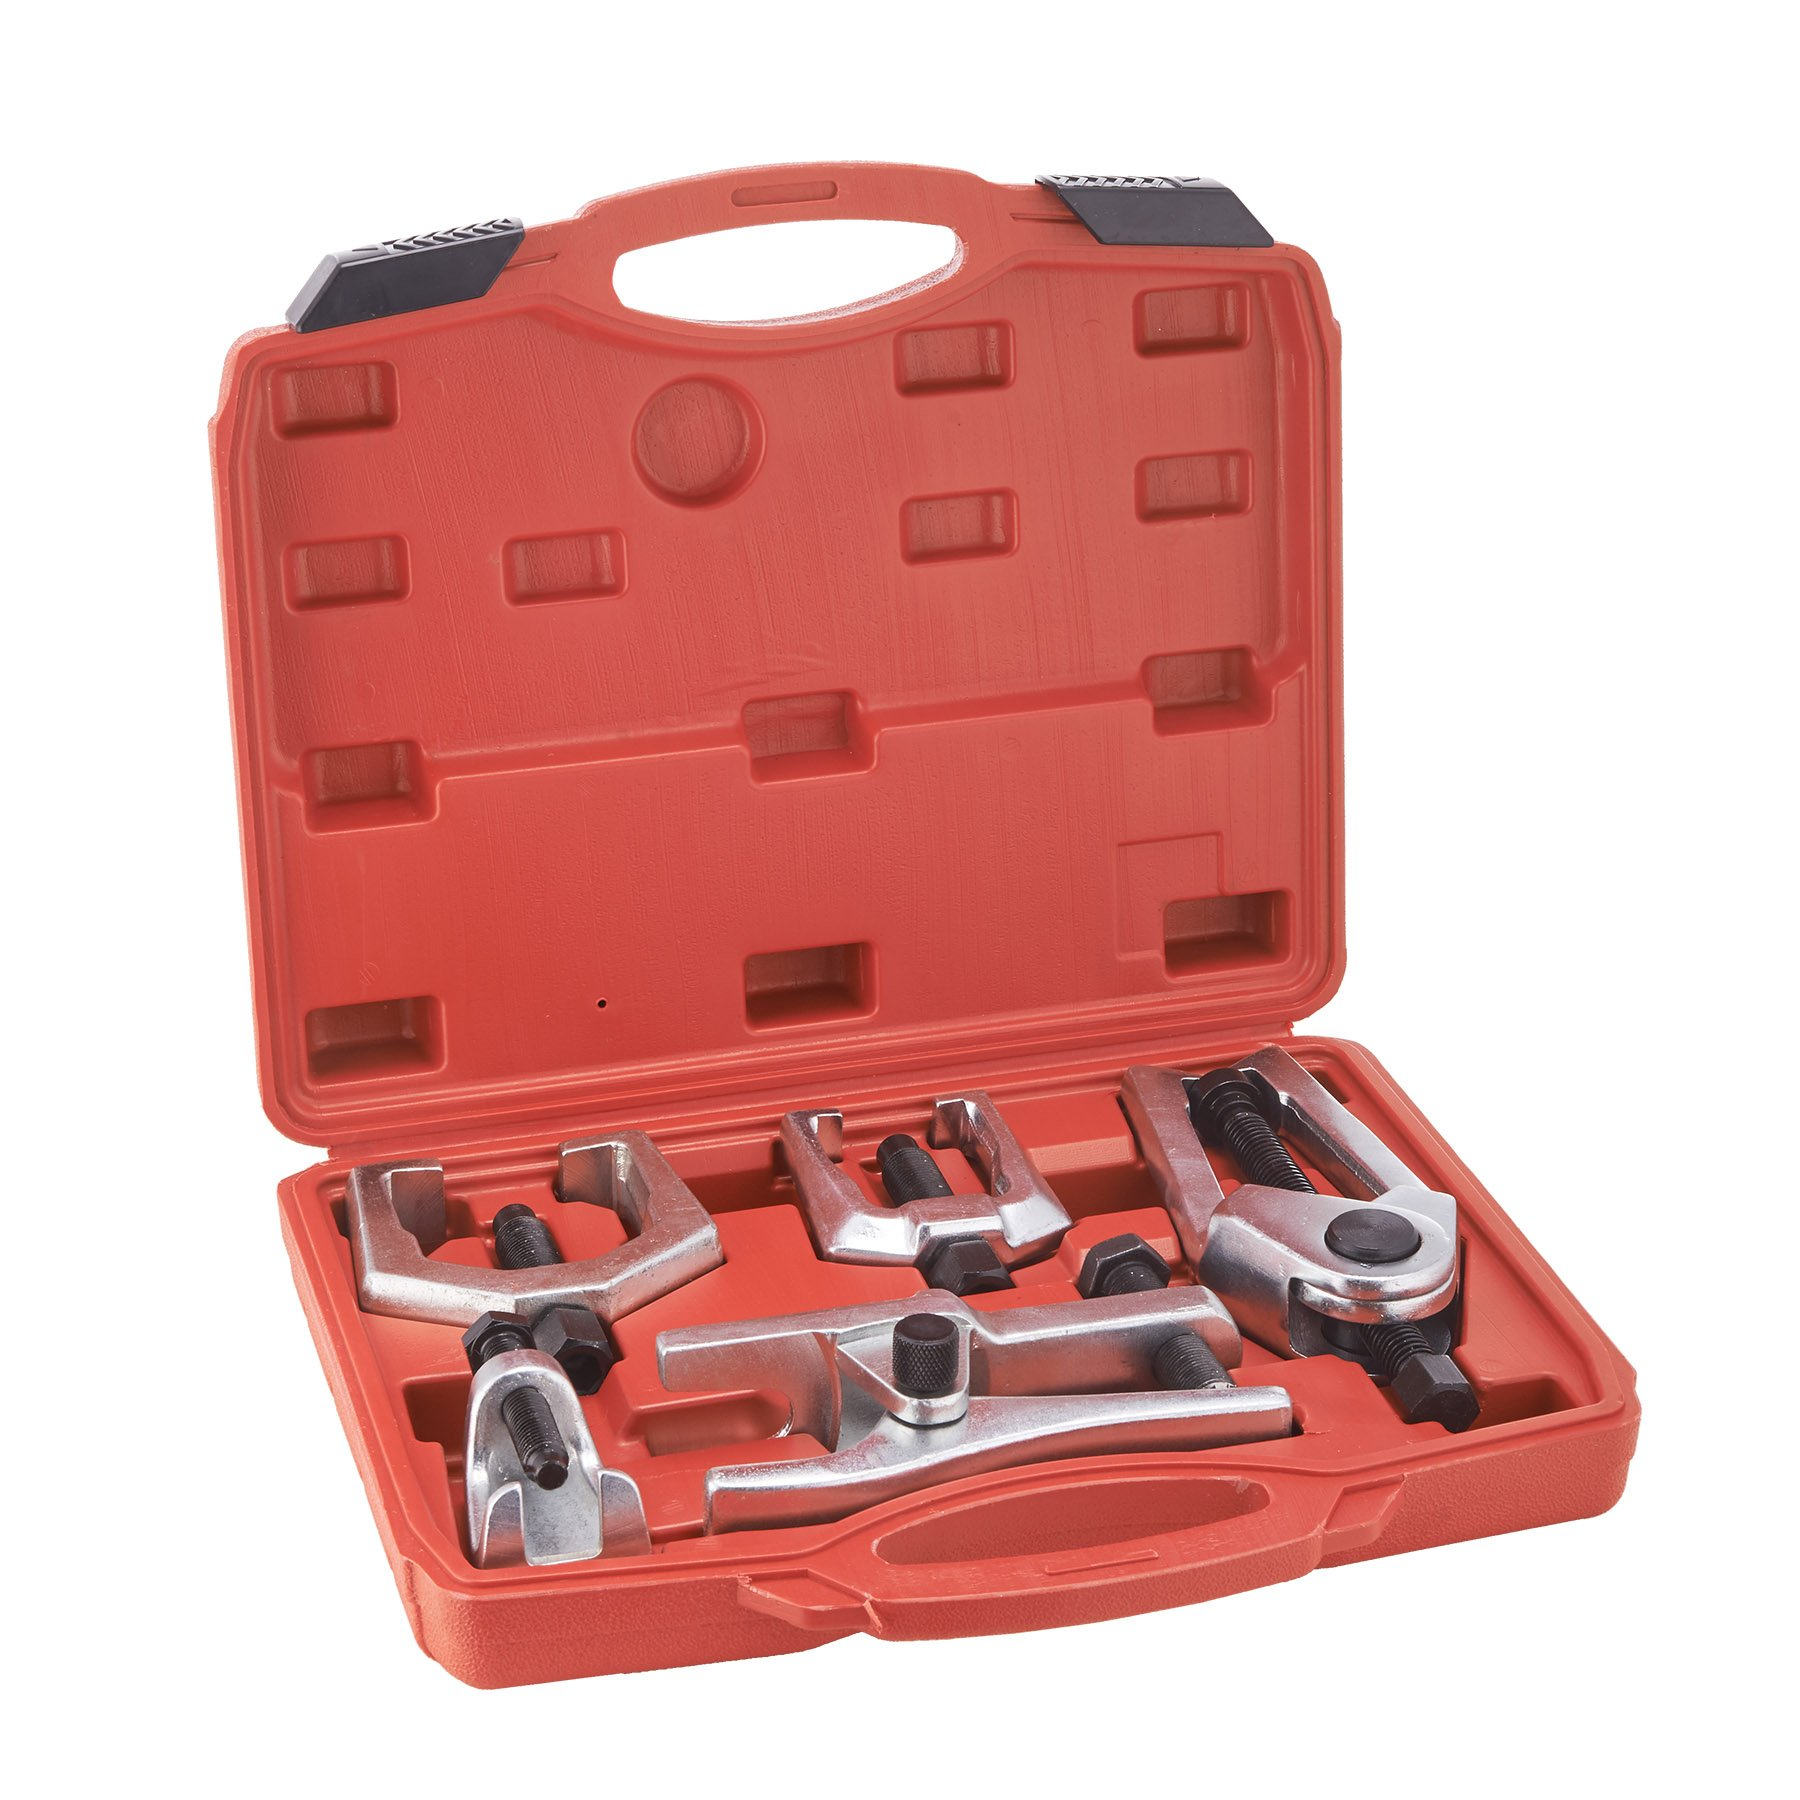 Biltek 6pc Front End Service Tool Kit Ball Joint Separator Pitman Arm Tie Rod Puller